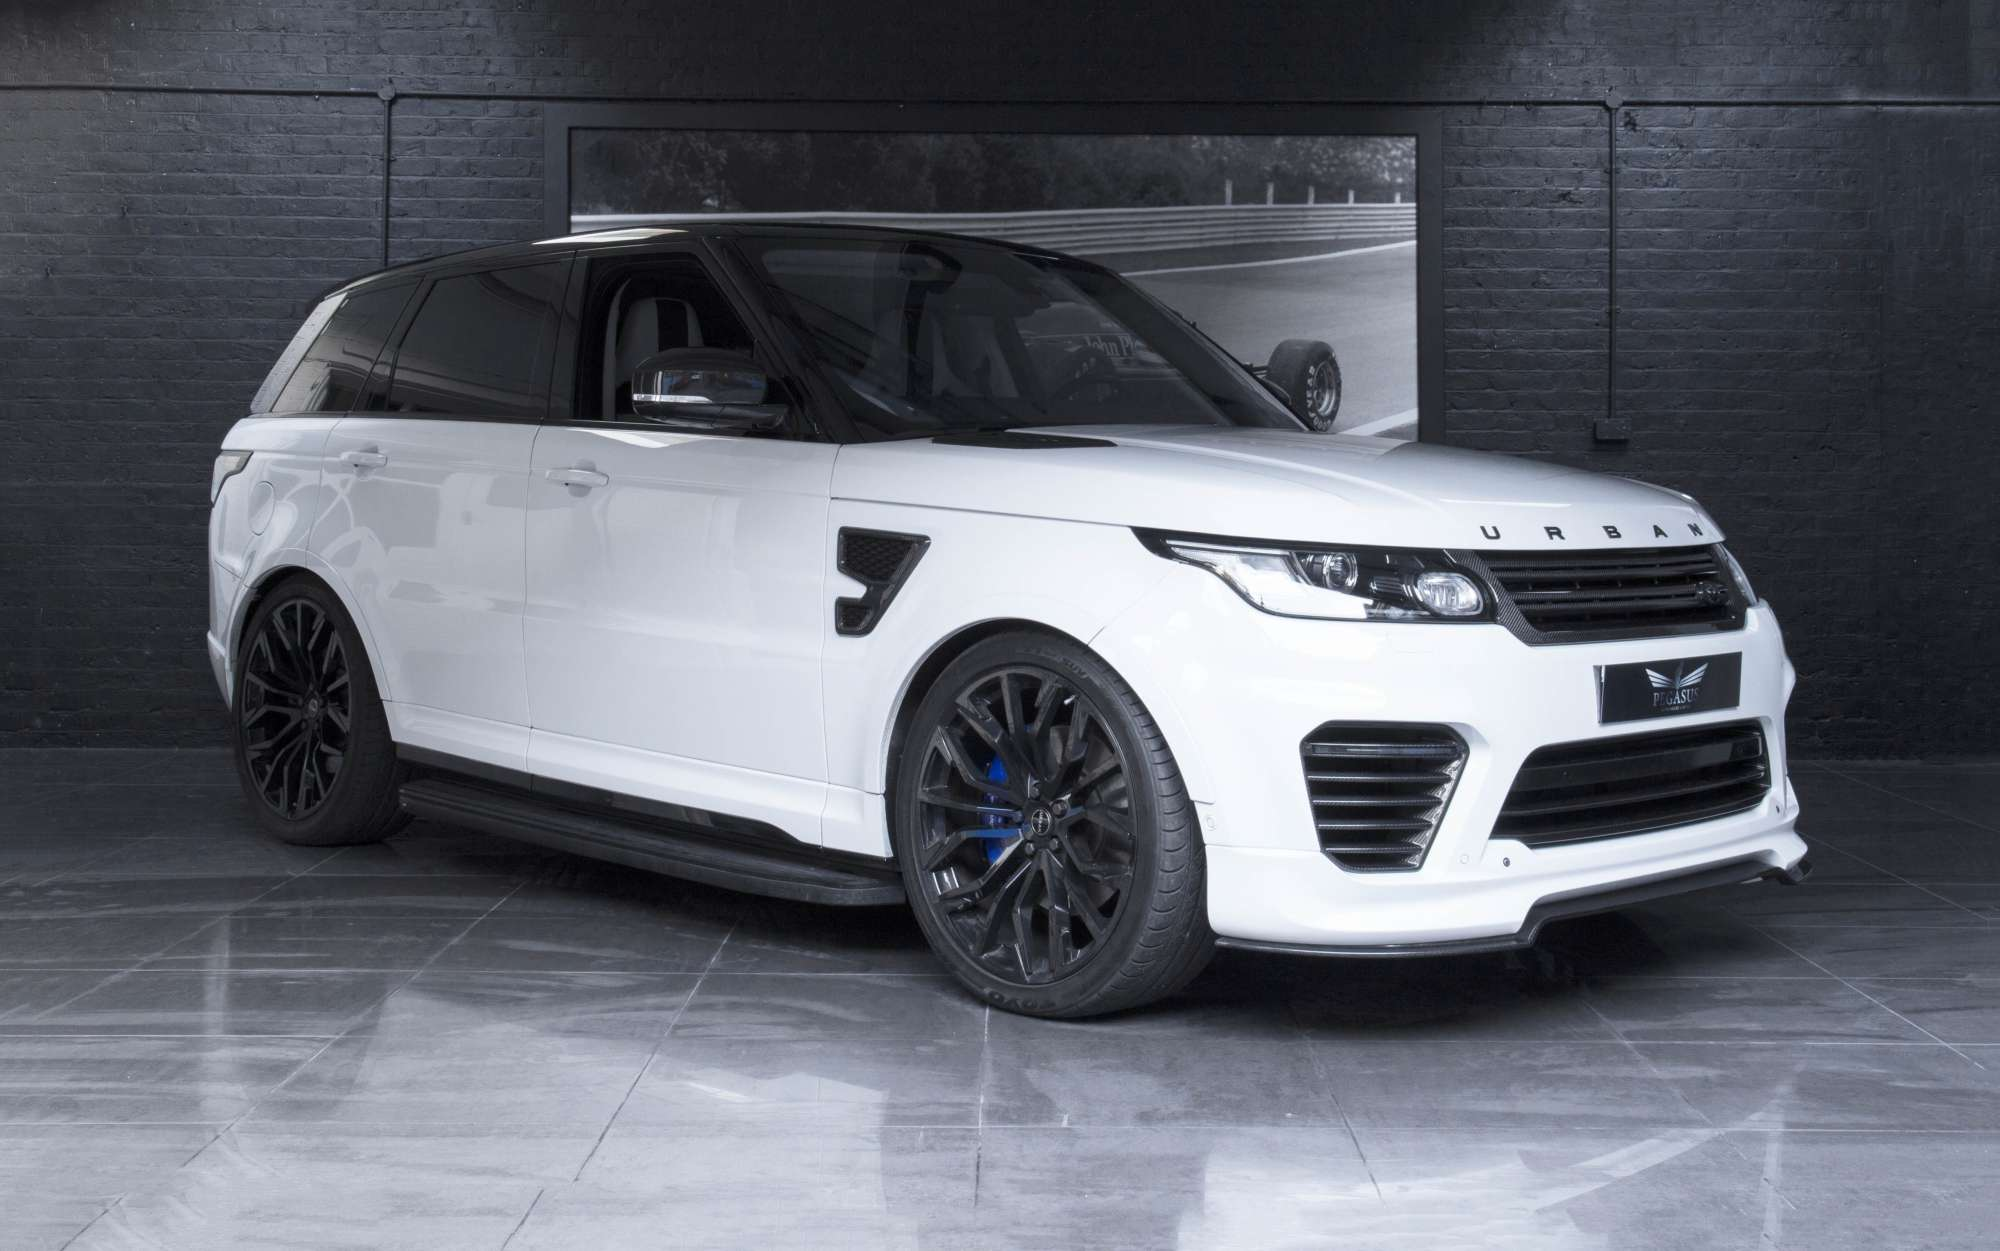 Range Rover Sport Svr Urban Automotive Pegasus Auto House